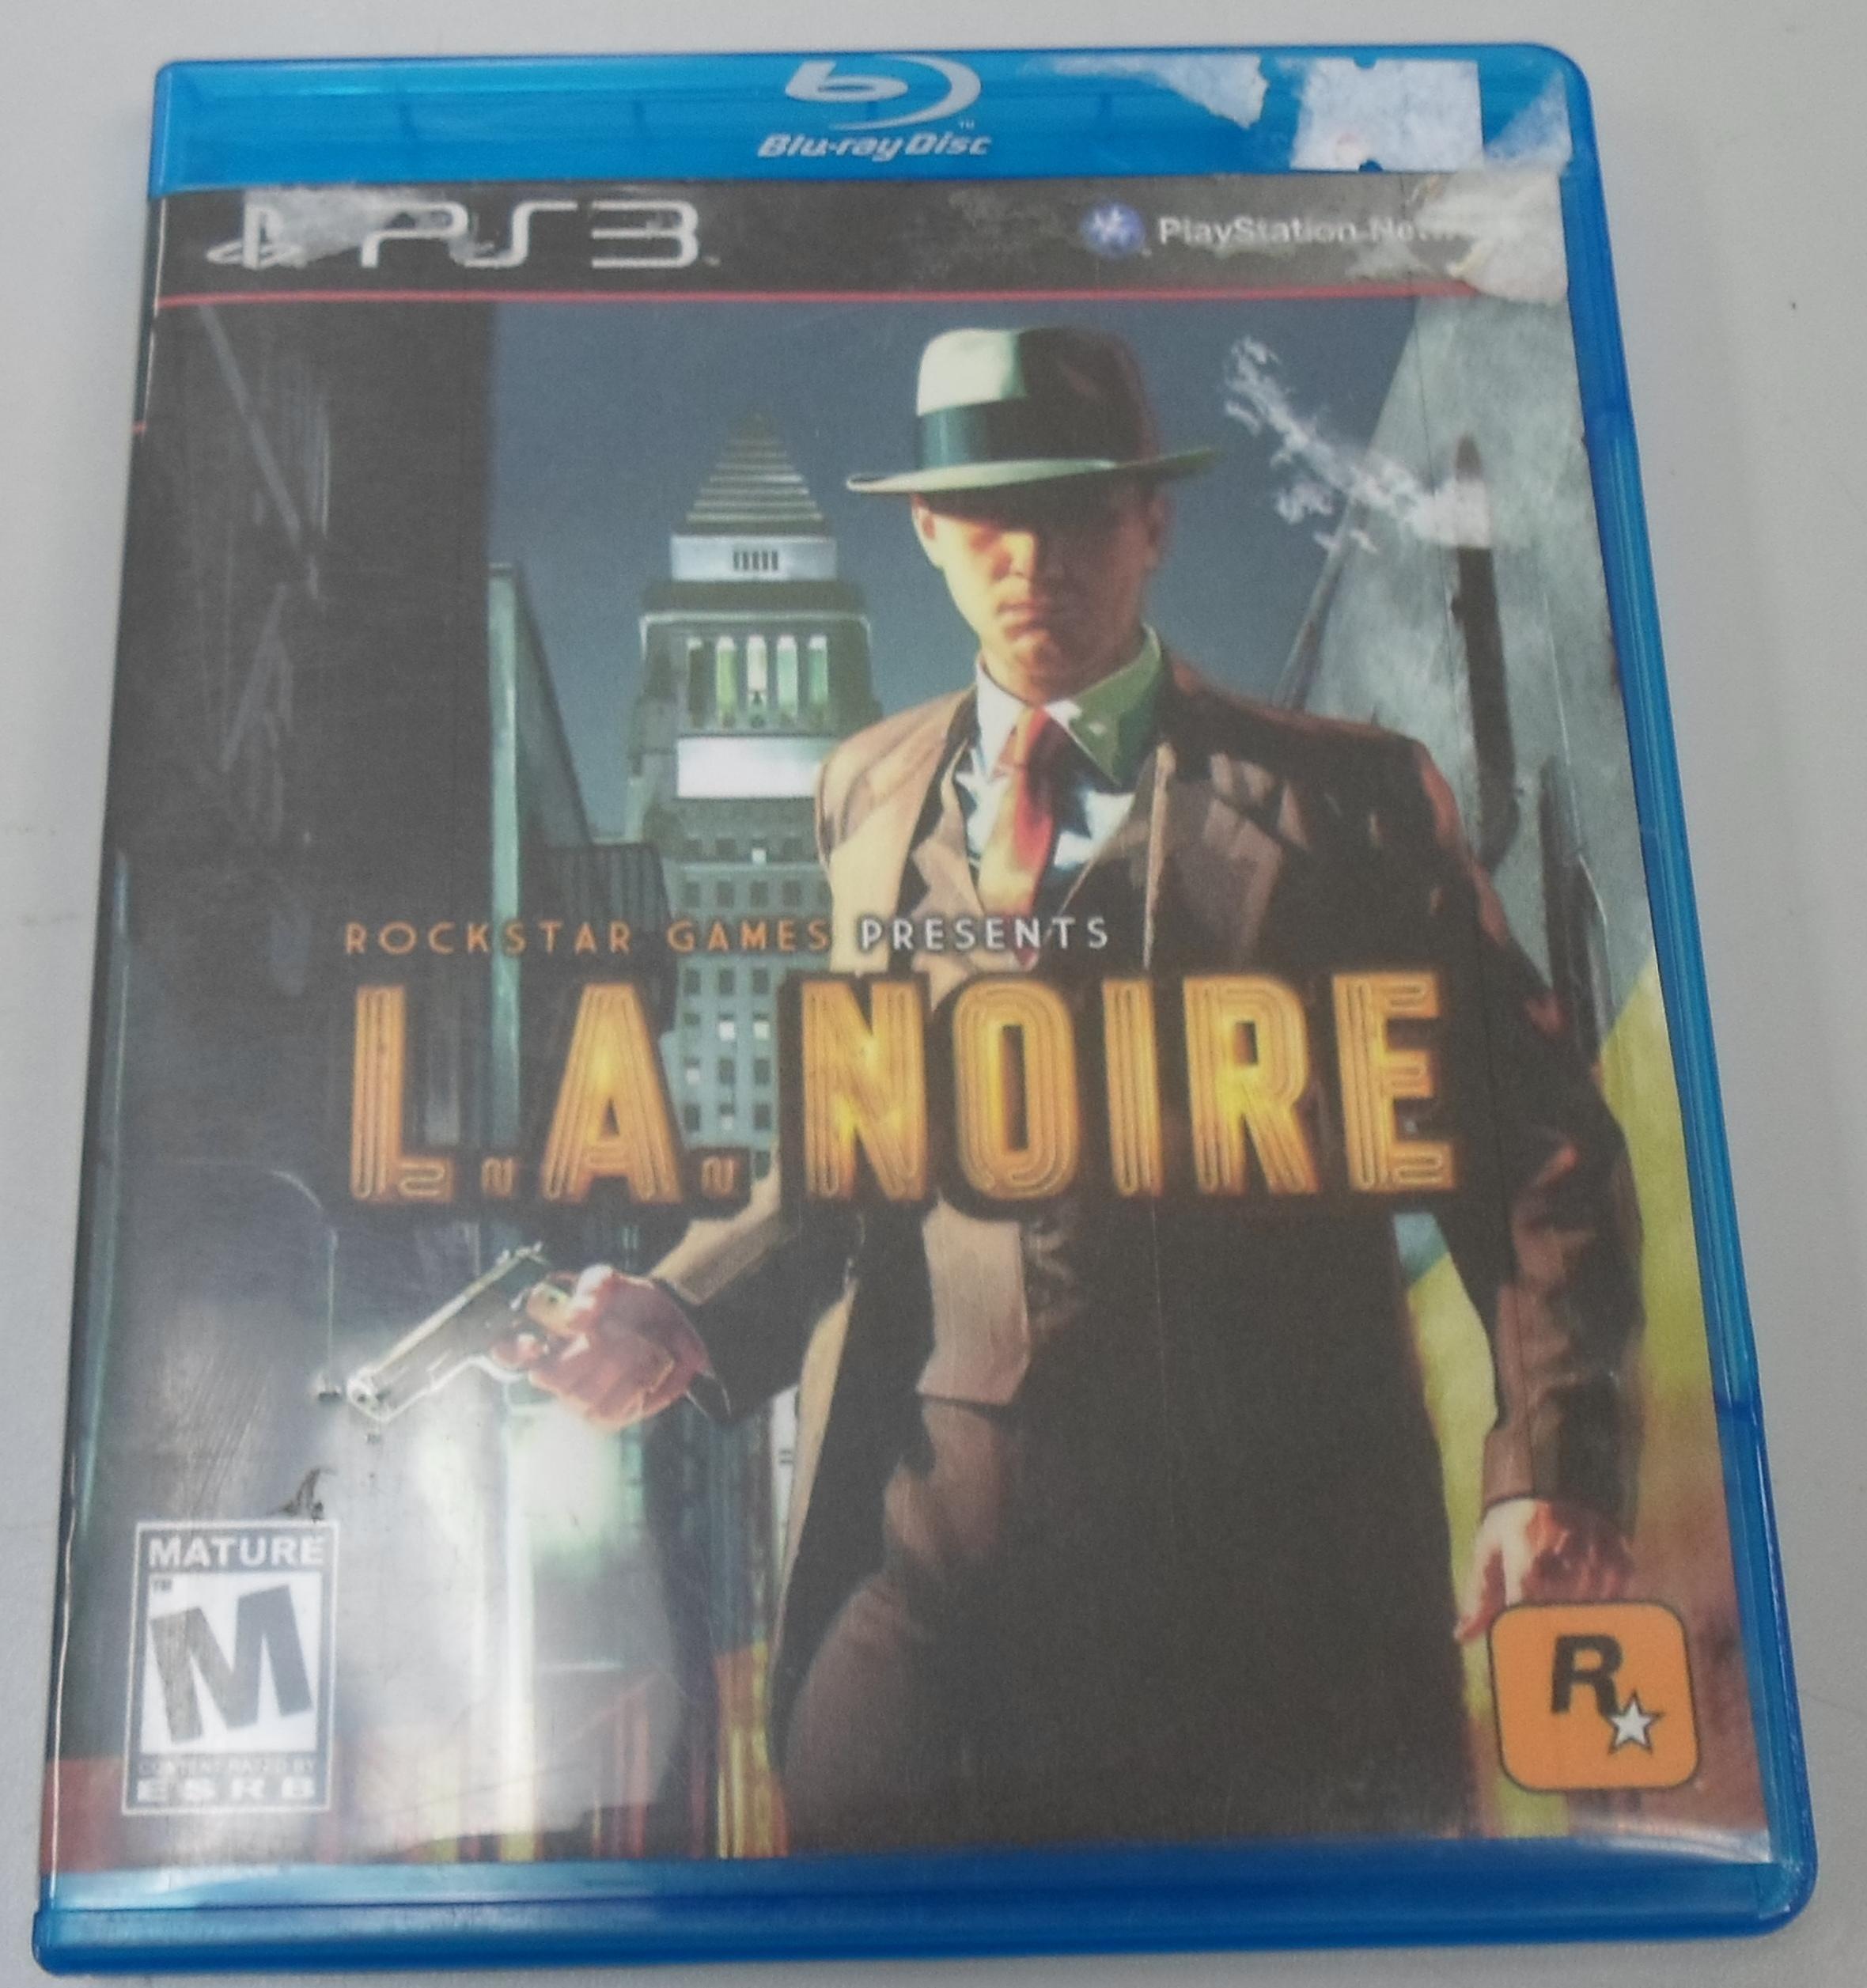 L.A. NOIRE - PLAYSTATION 3 GAME